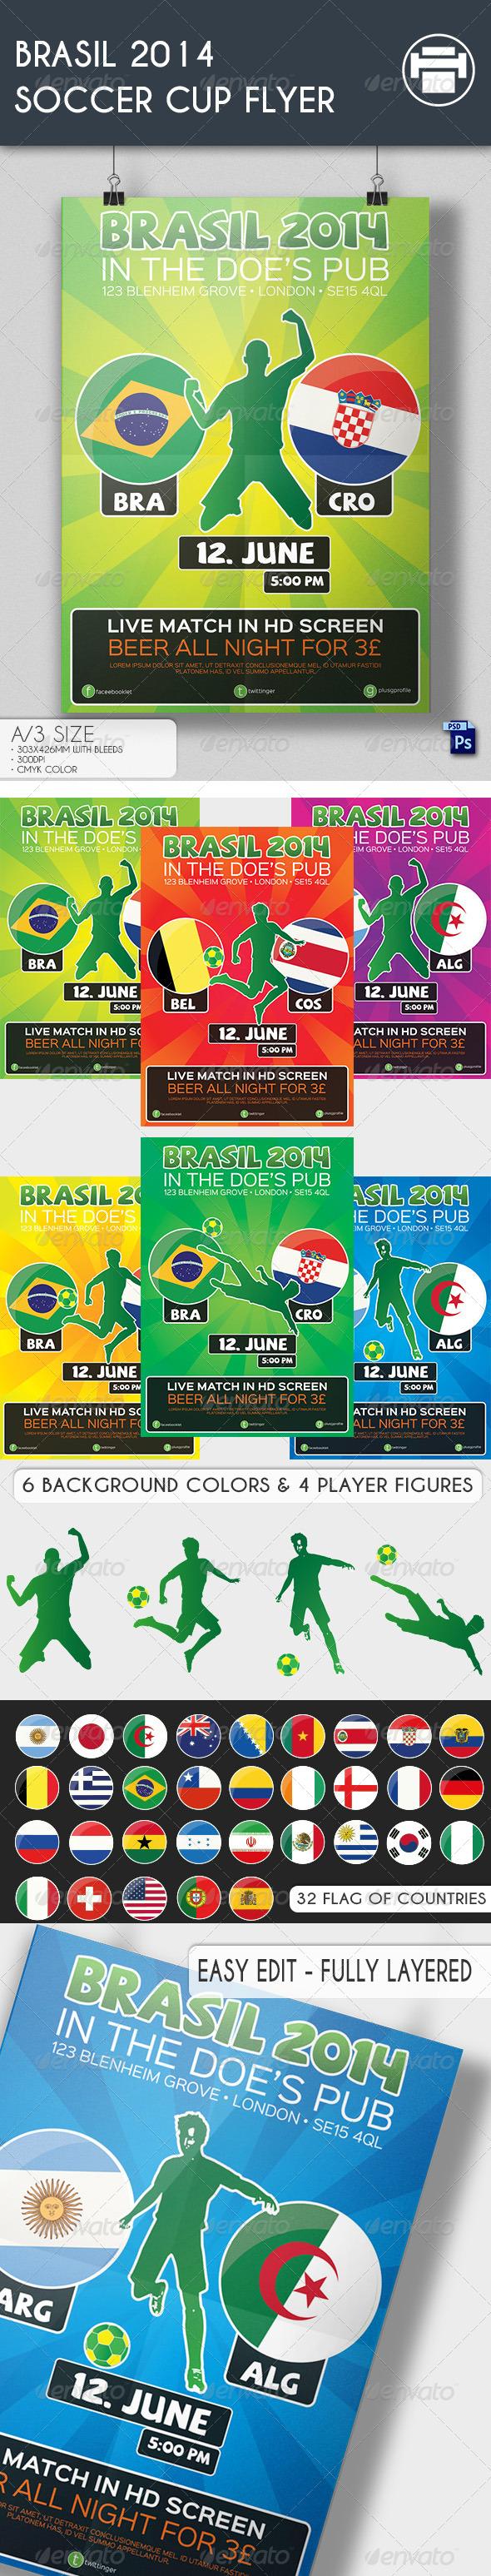 GraphicRiver Brasil 2014 Soccer Cup Flyer 7854702